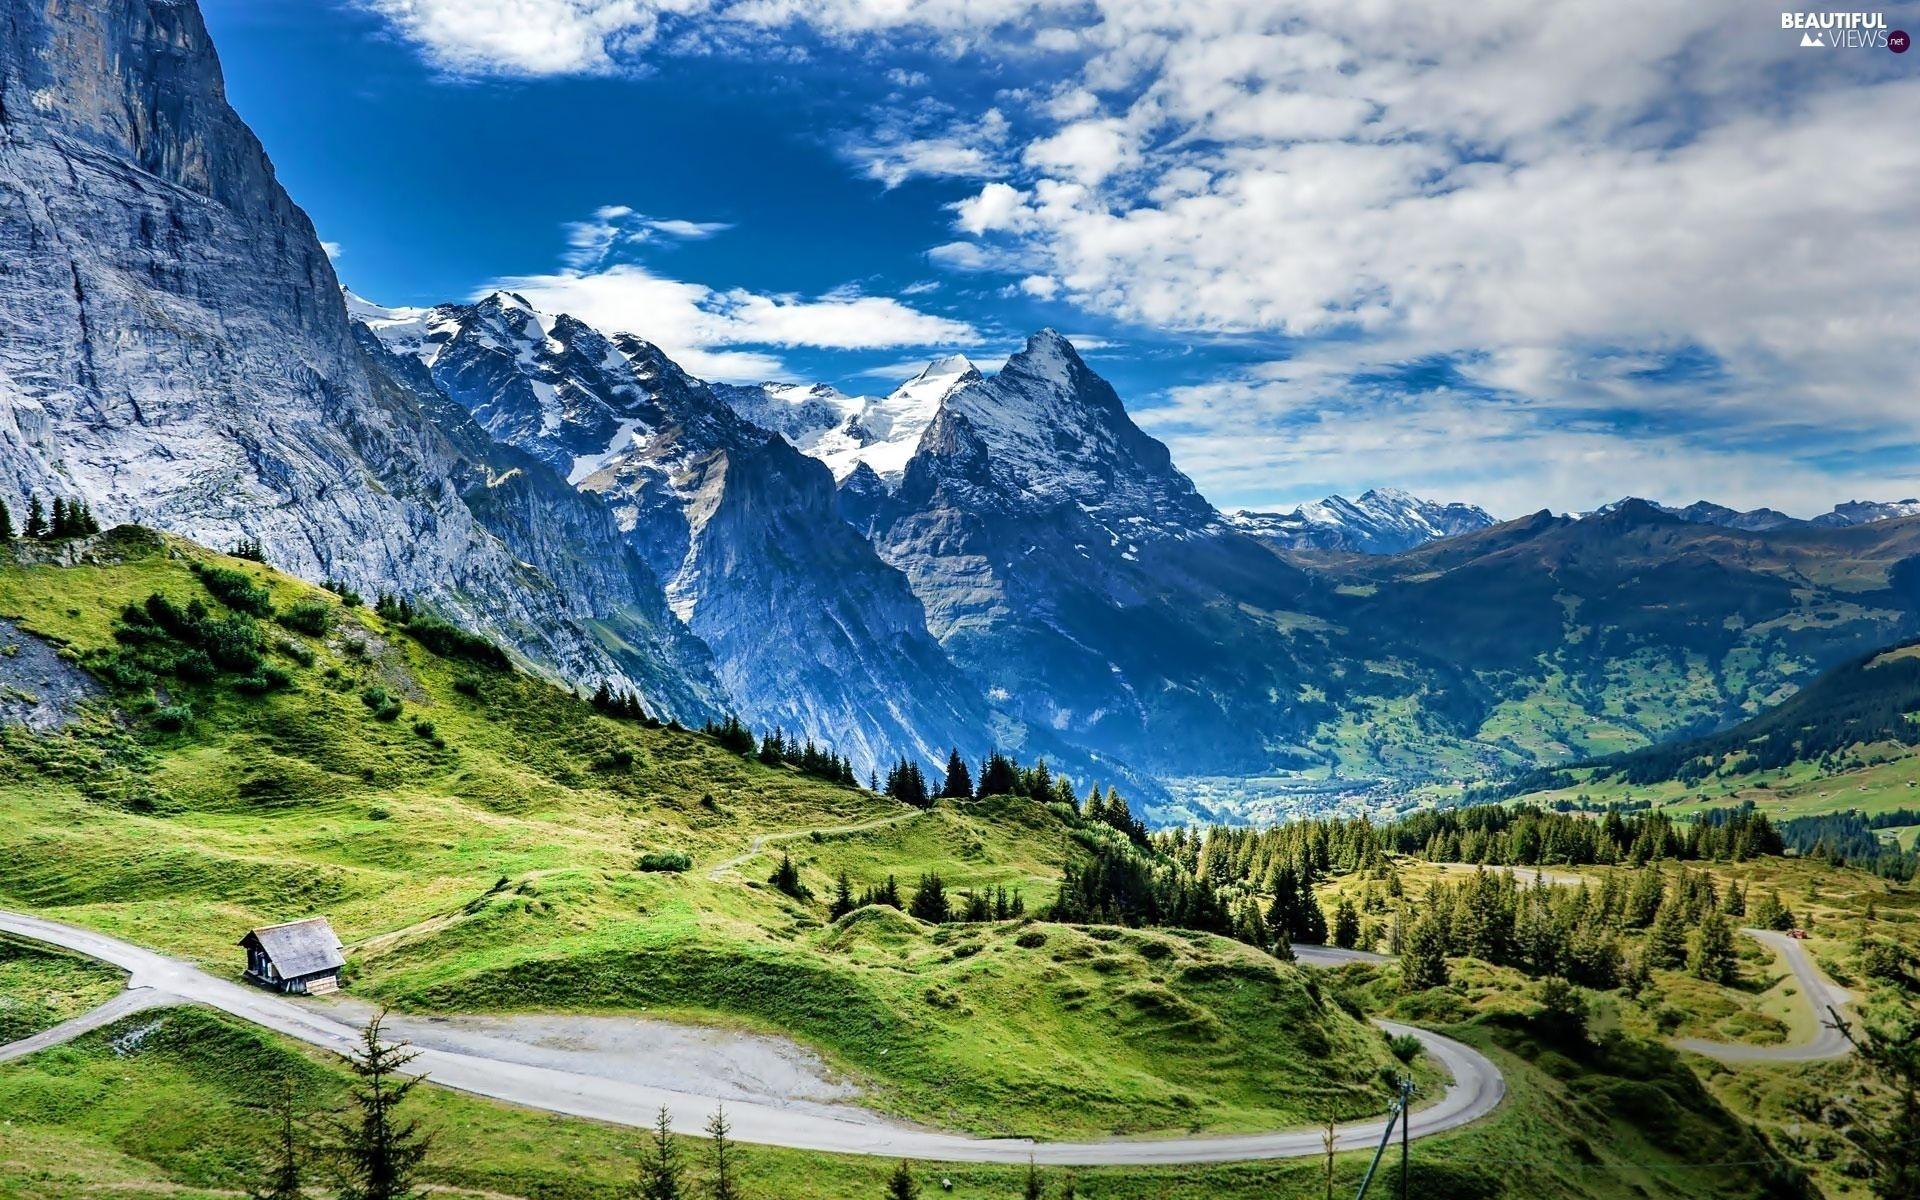 House Roads Glade Mountains Switzerland Woods